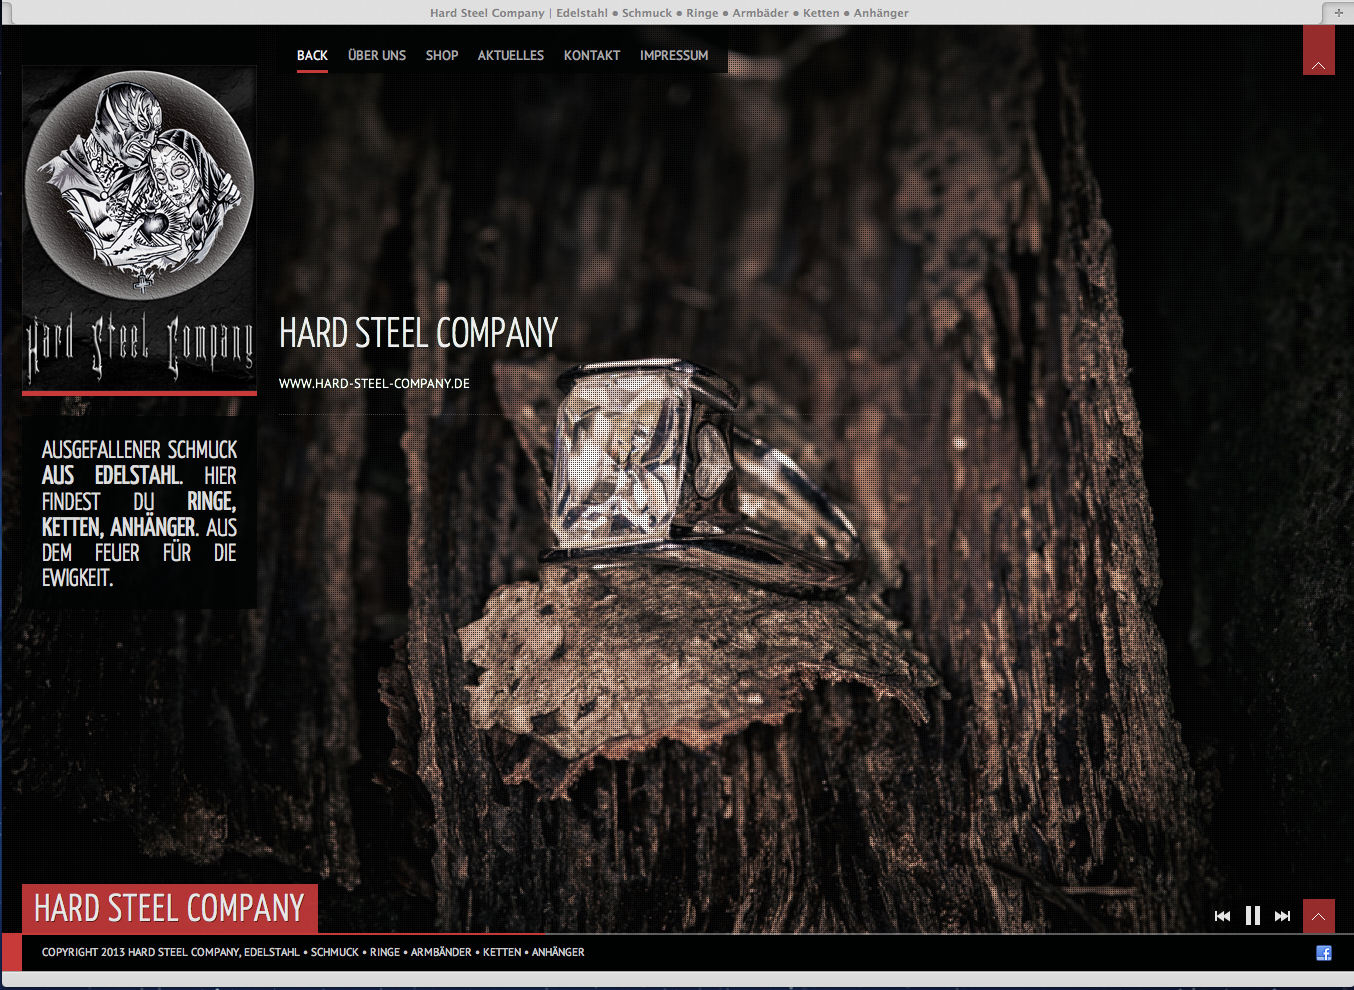 Edelstahlschmuck Hard Steel Company